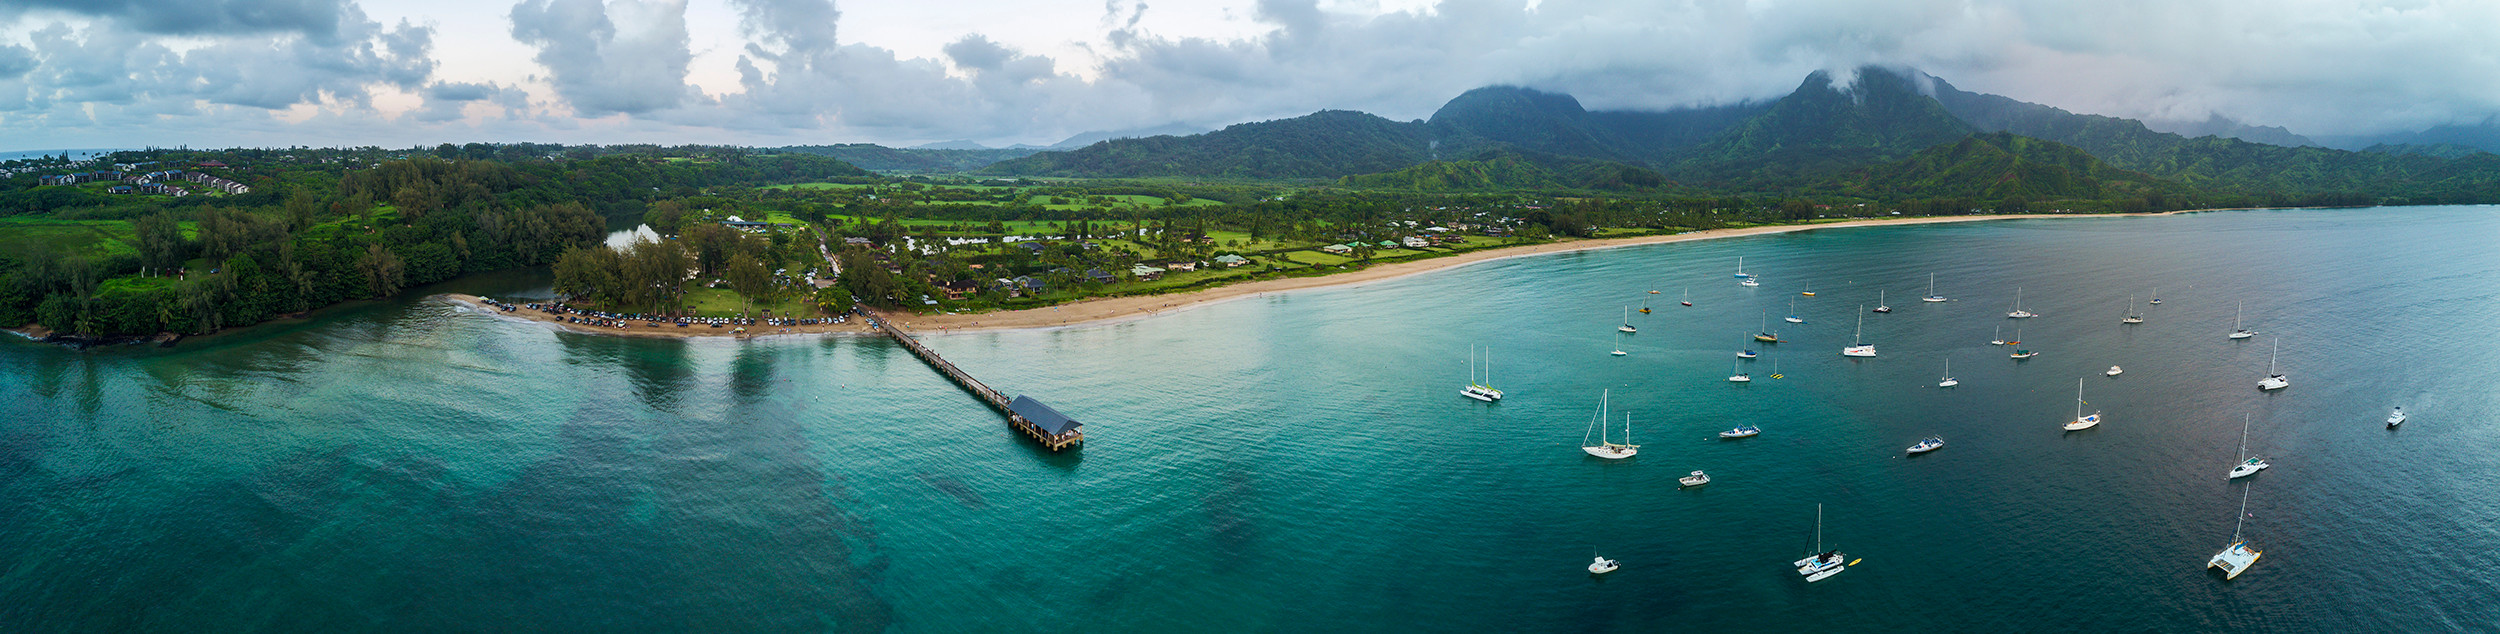 Hawaii Hanalei Pier.jpg